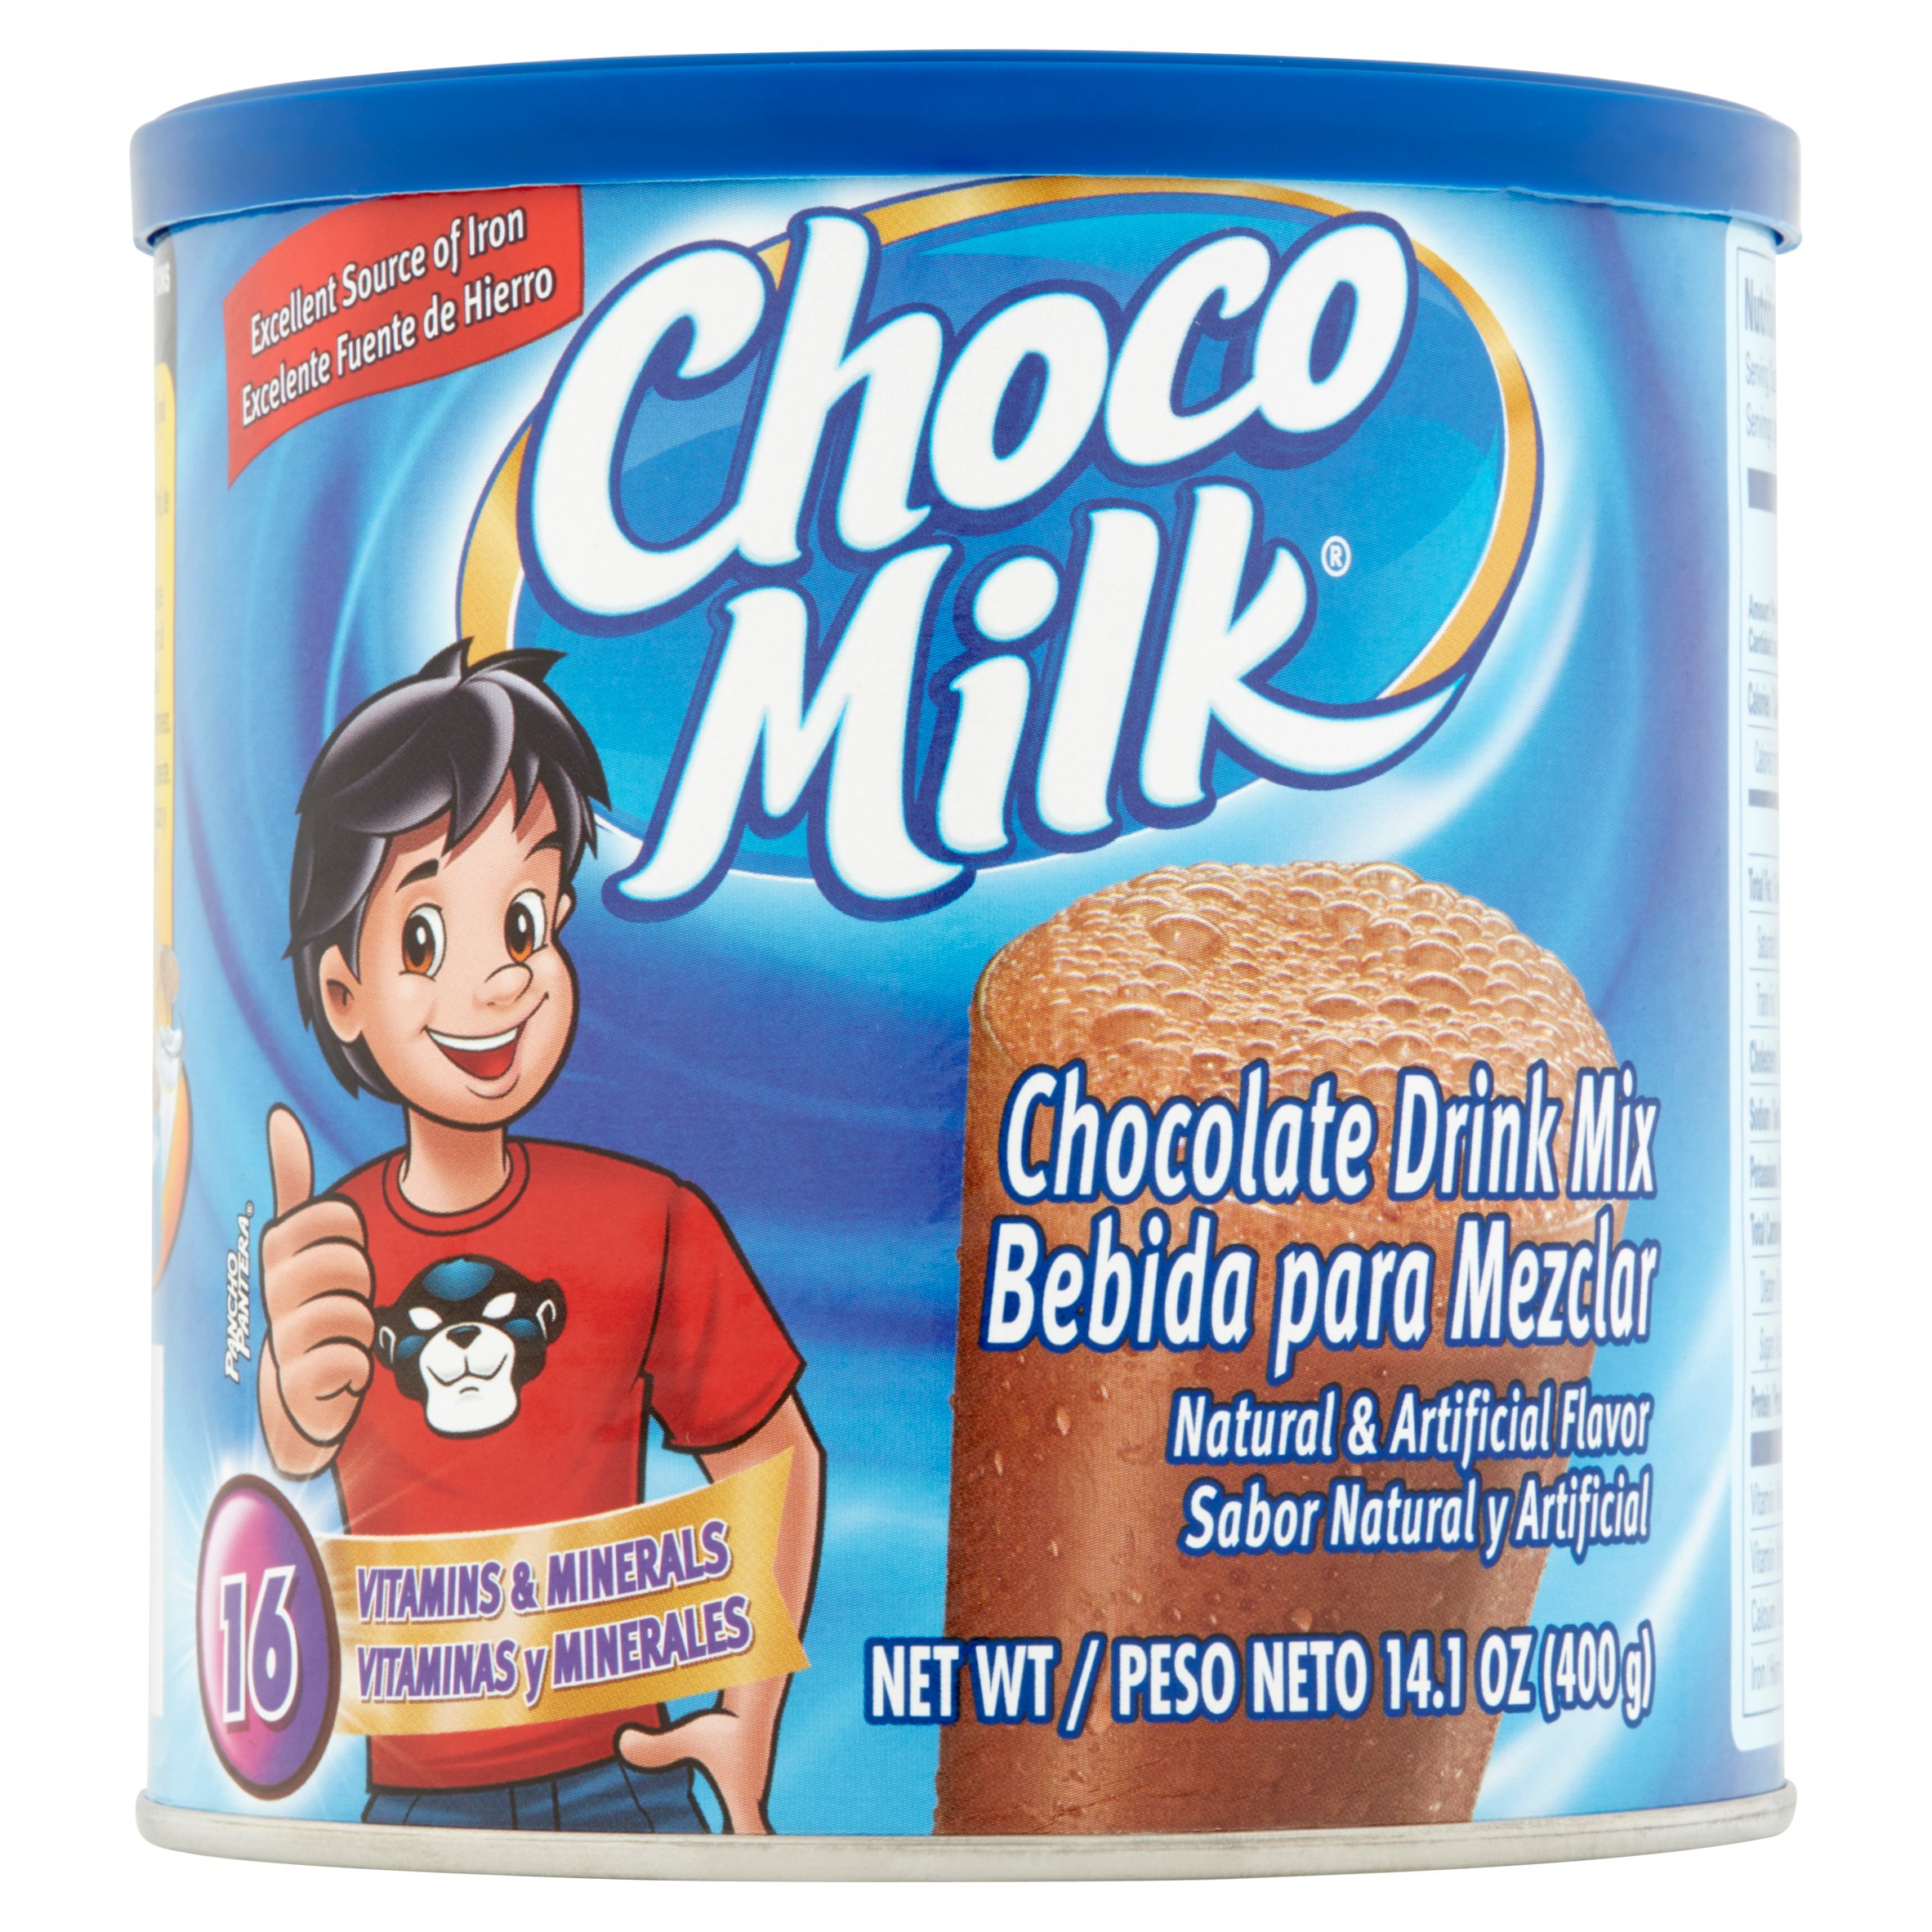 (2 Pack) Choco Milk Chocolate Drink Mix, 14.1 oz